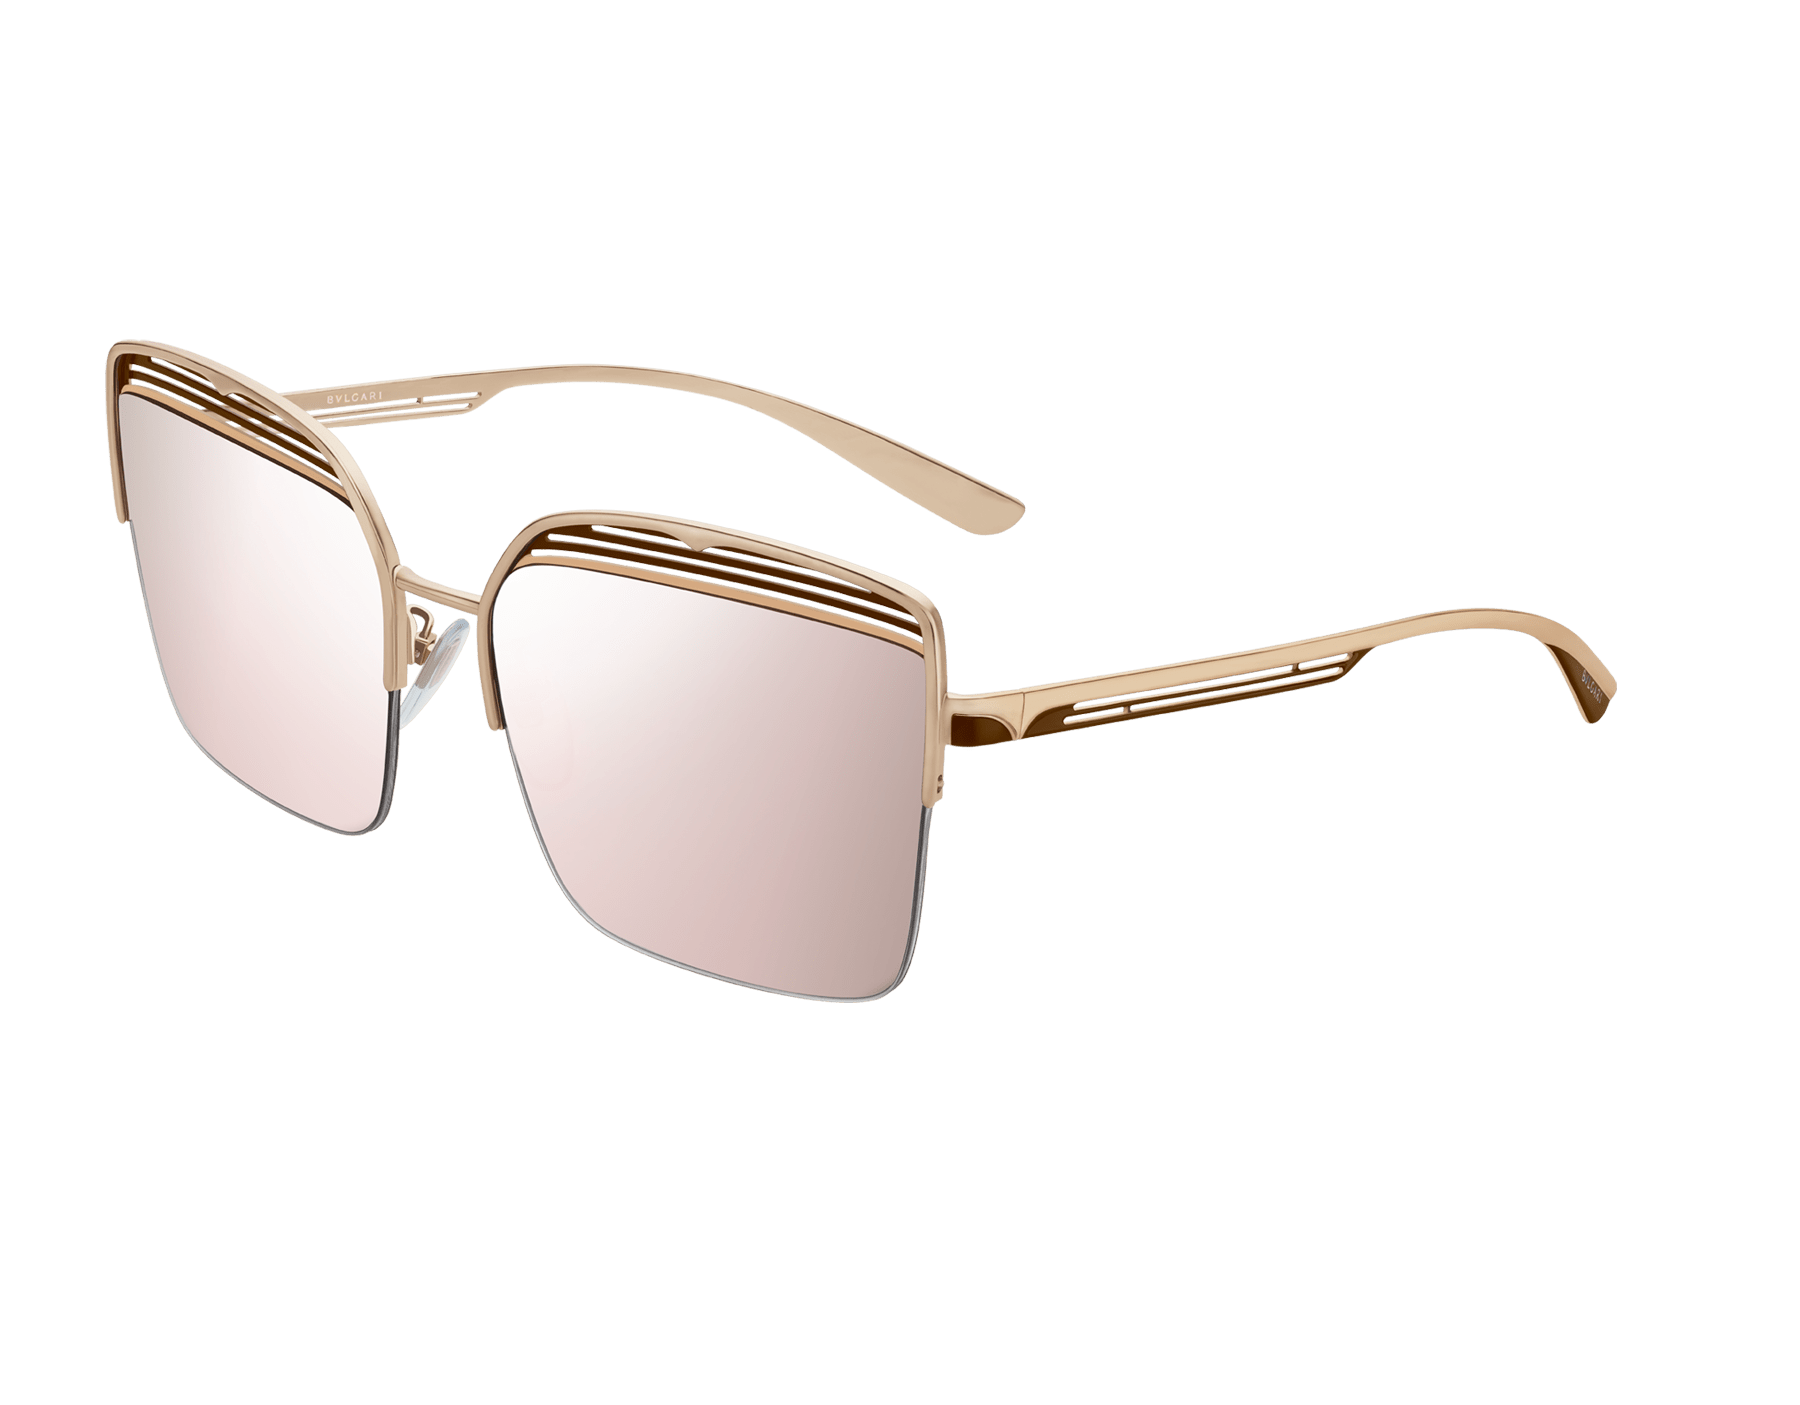 Bvlgari B.zero1 B.overvibe half-rim square metal sunglasses. 903812 image 1